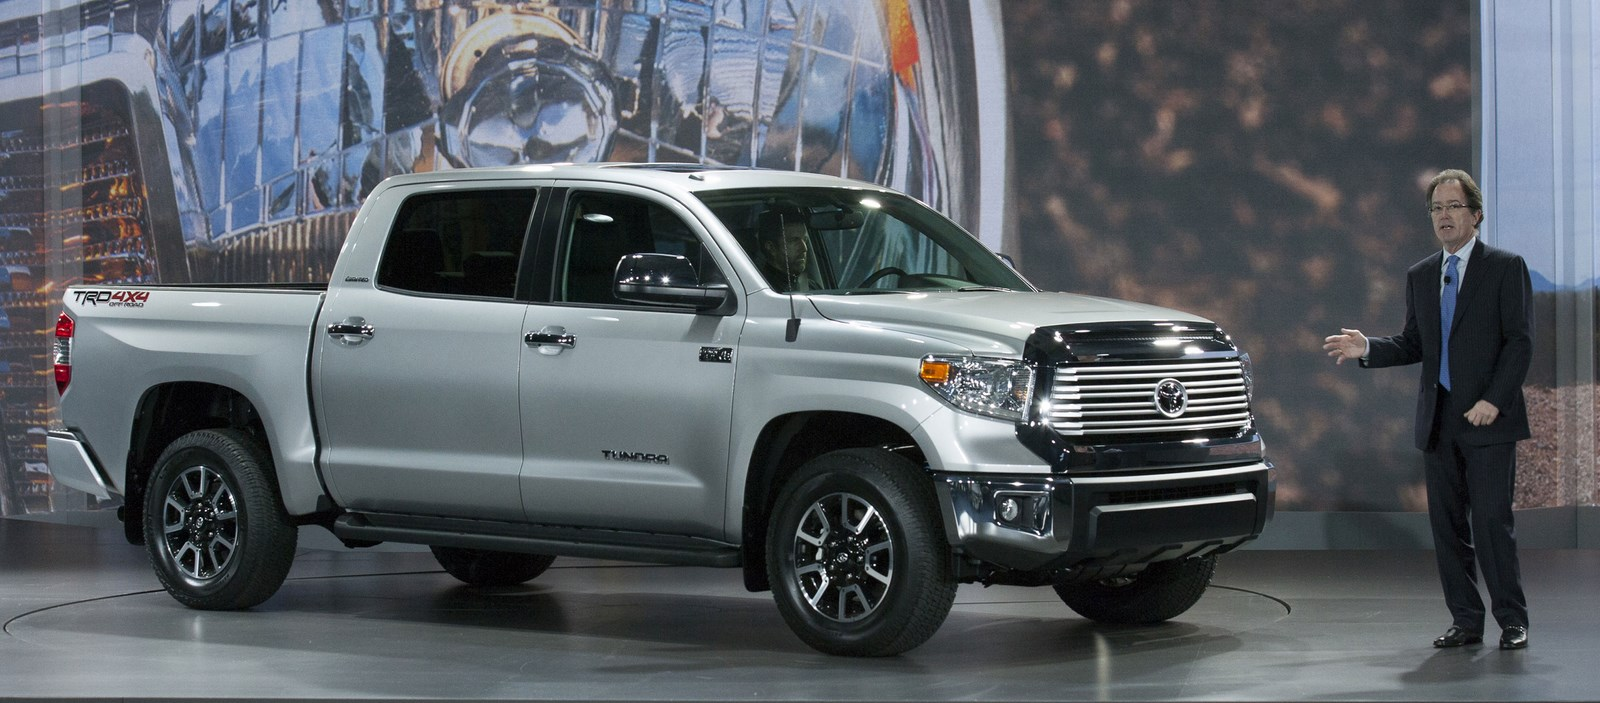 Toyota Tundra 2014 [w/video]